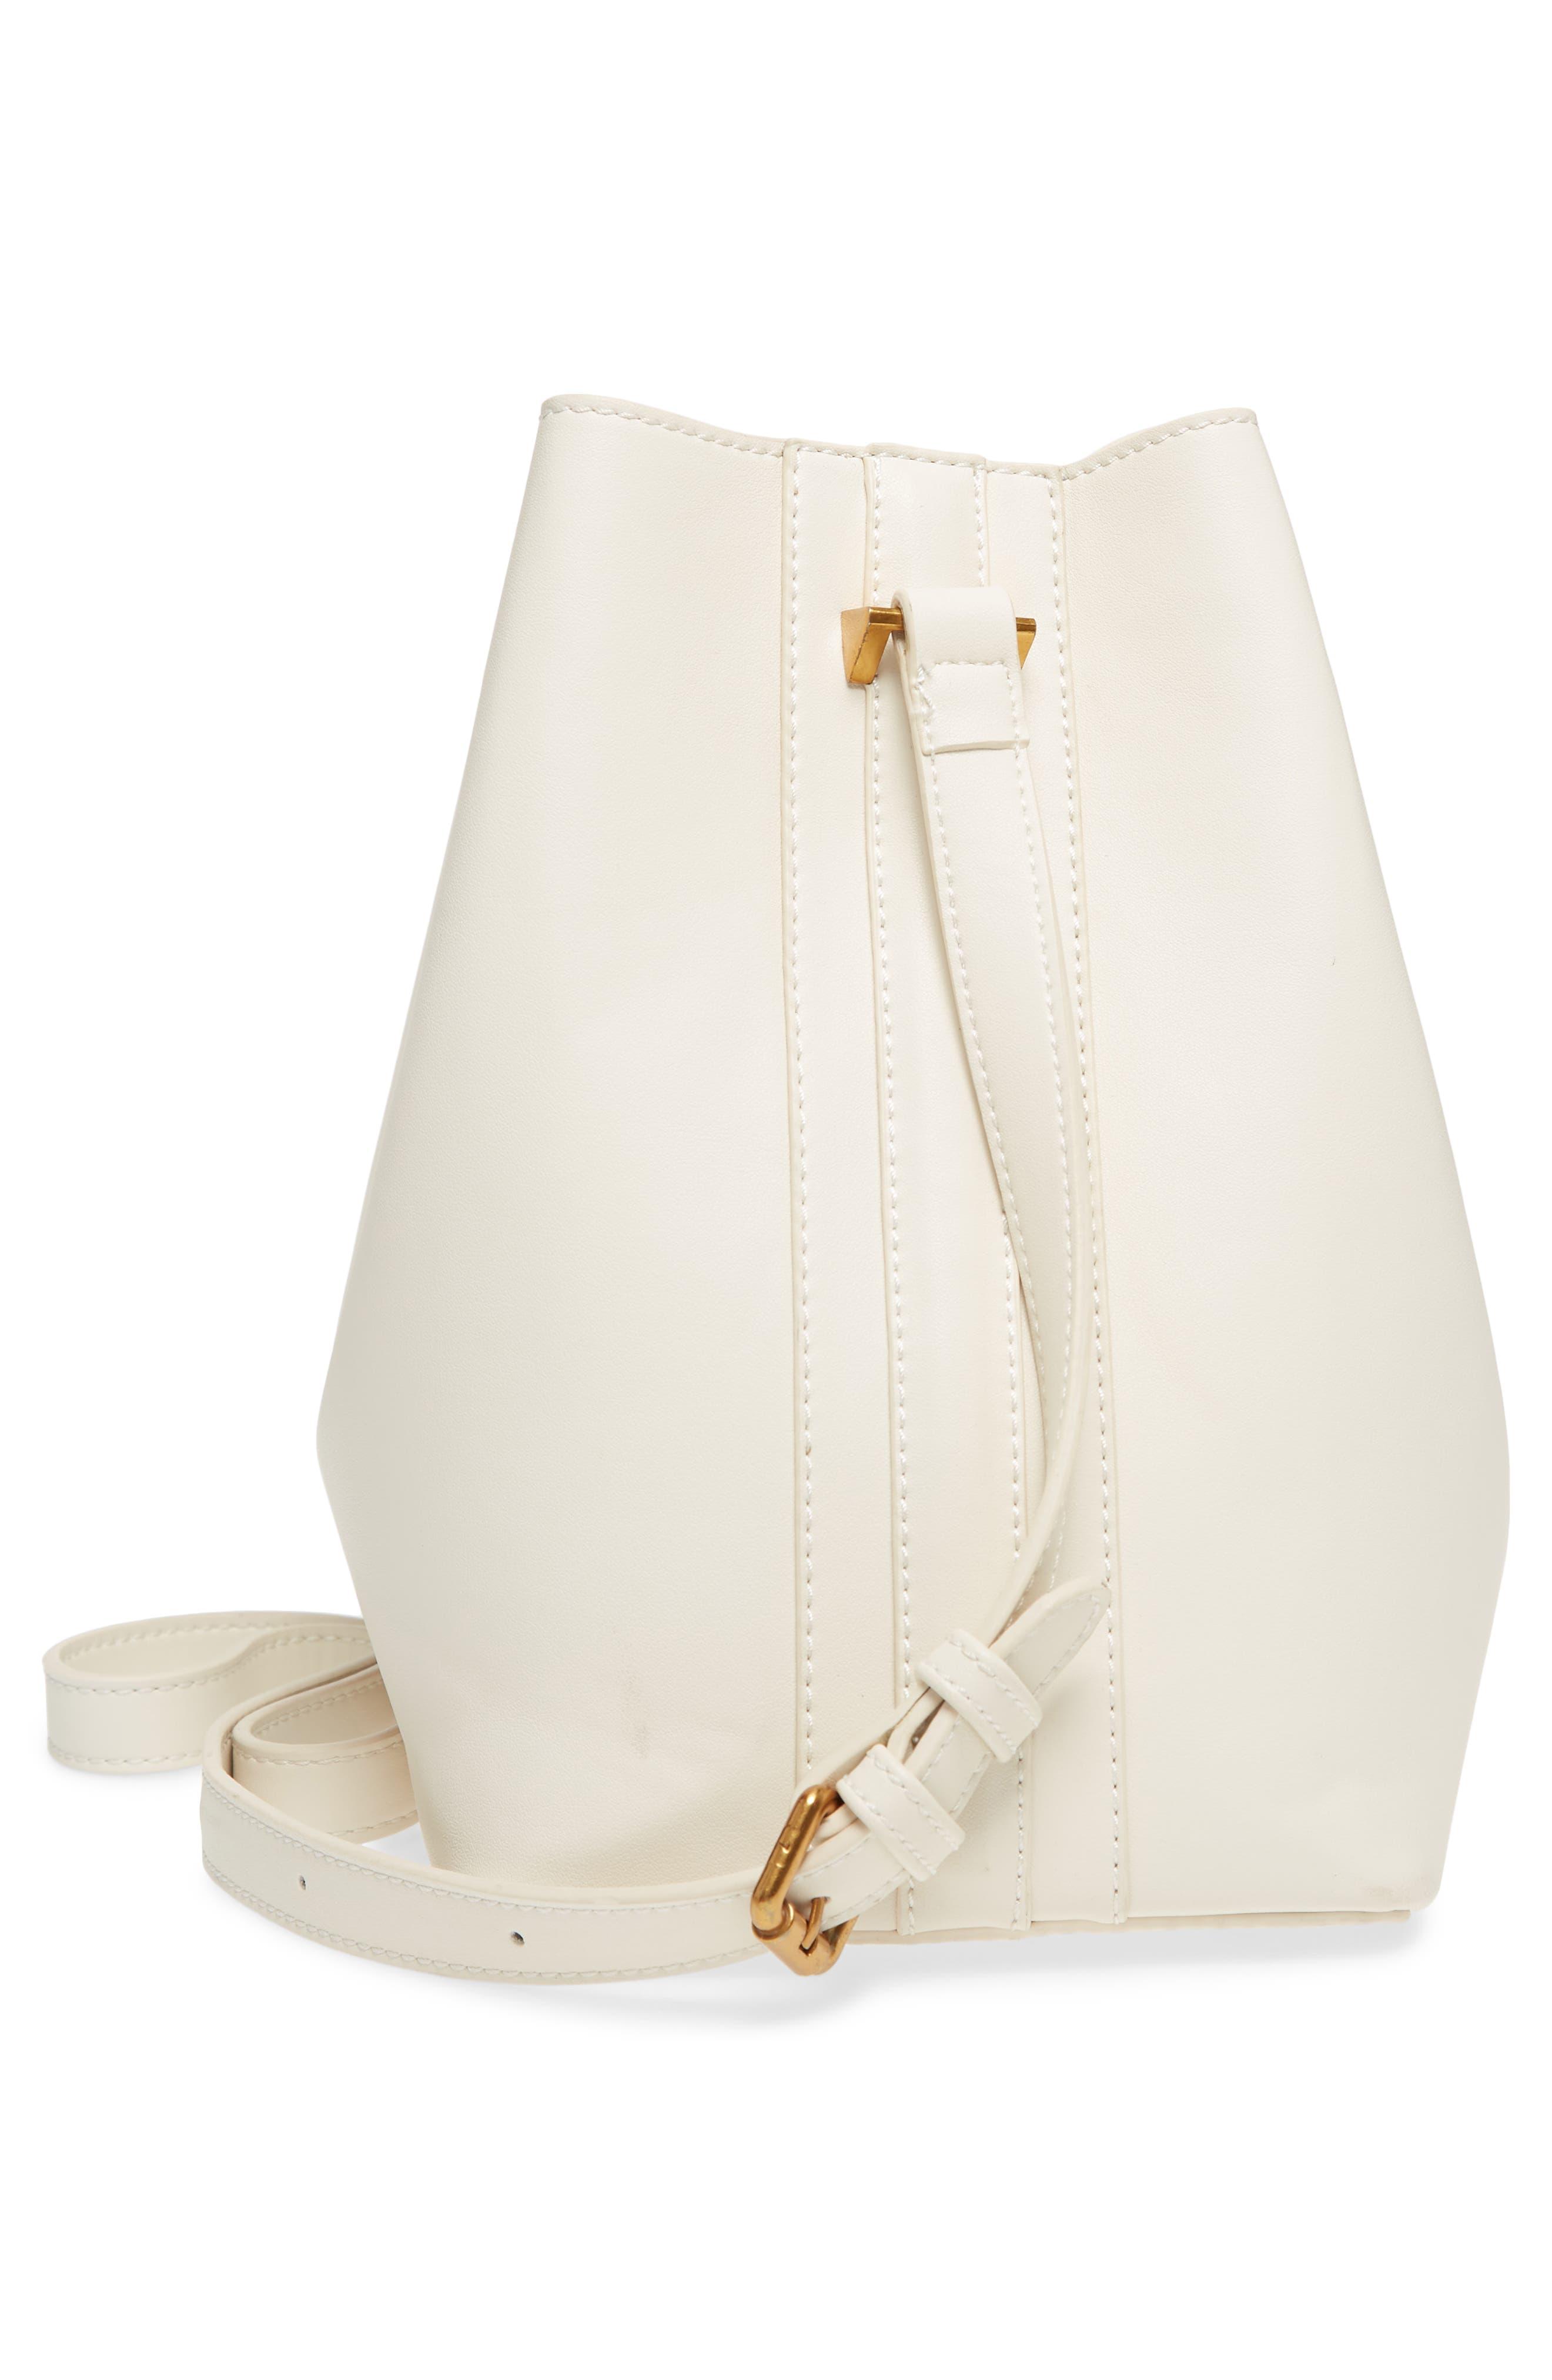 Faux Leather Bucket Tote,                             Alternate thumbnail 5, color,                             White/ Blush